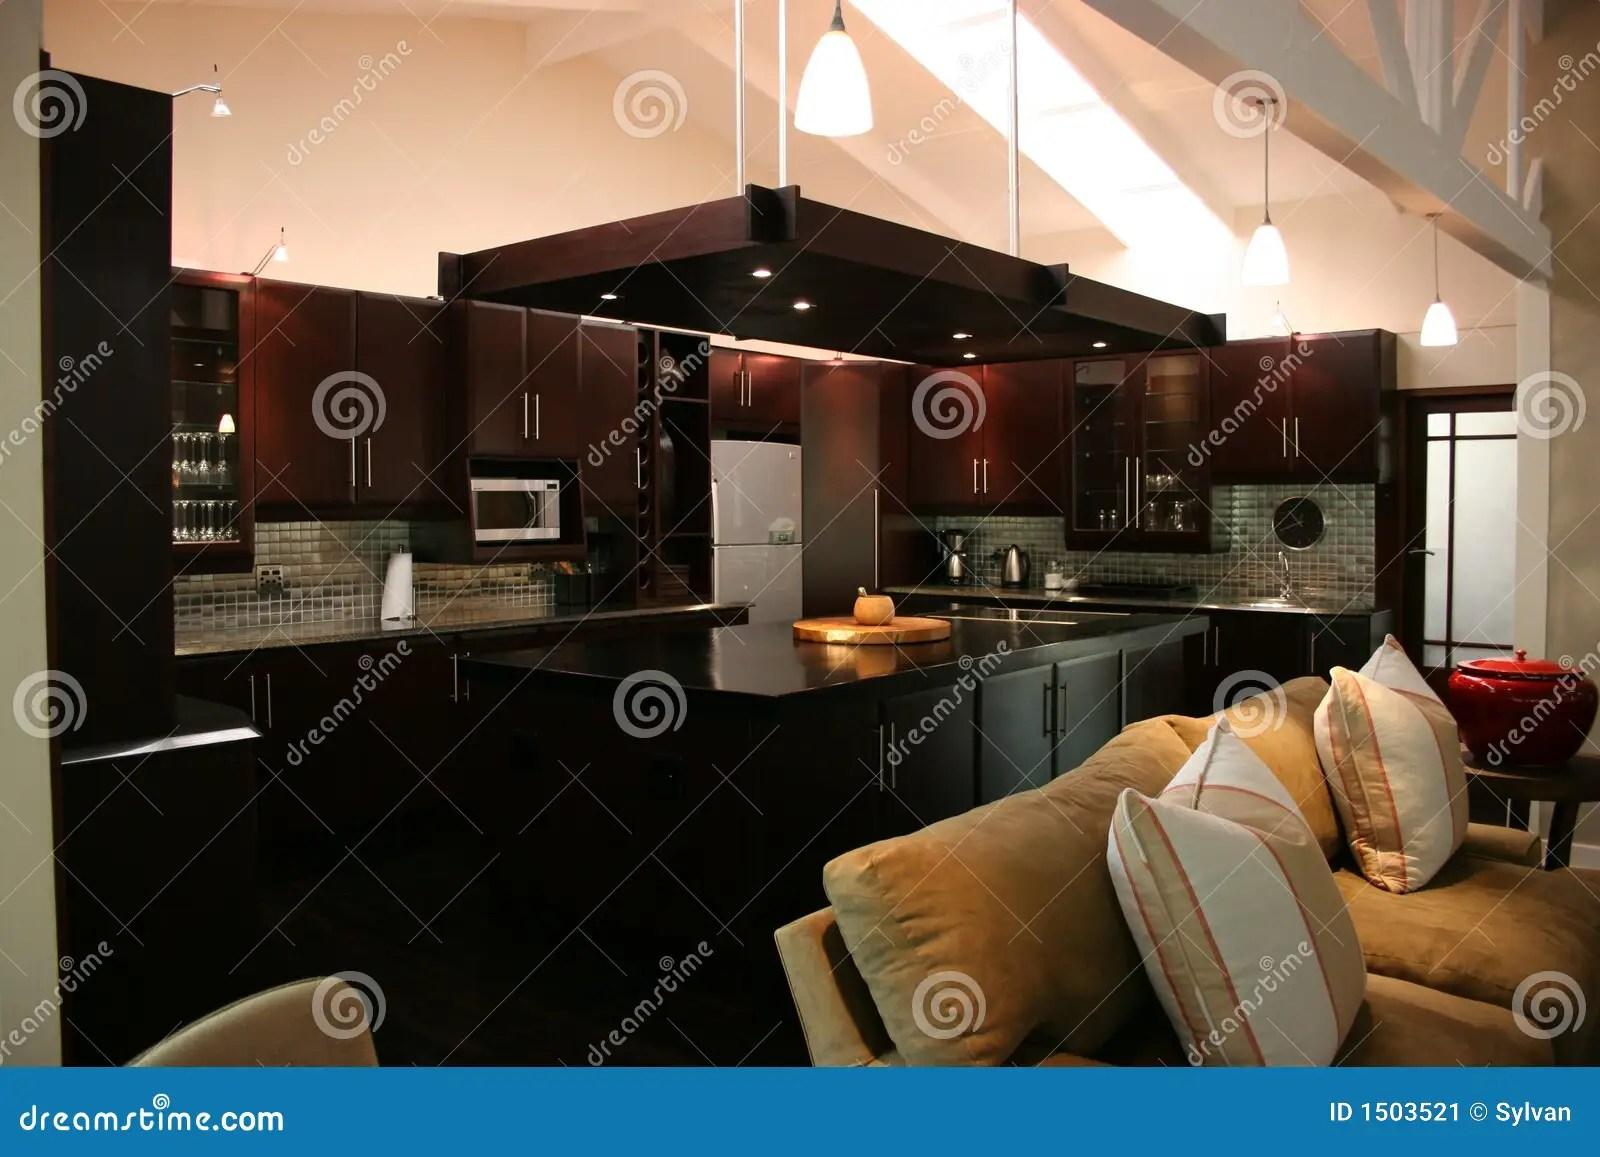 Modern African Interior Kitchen Stock Image  Image 1503521